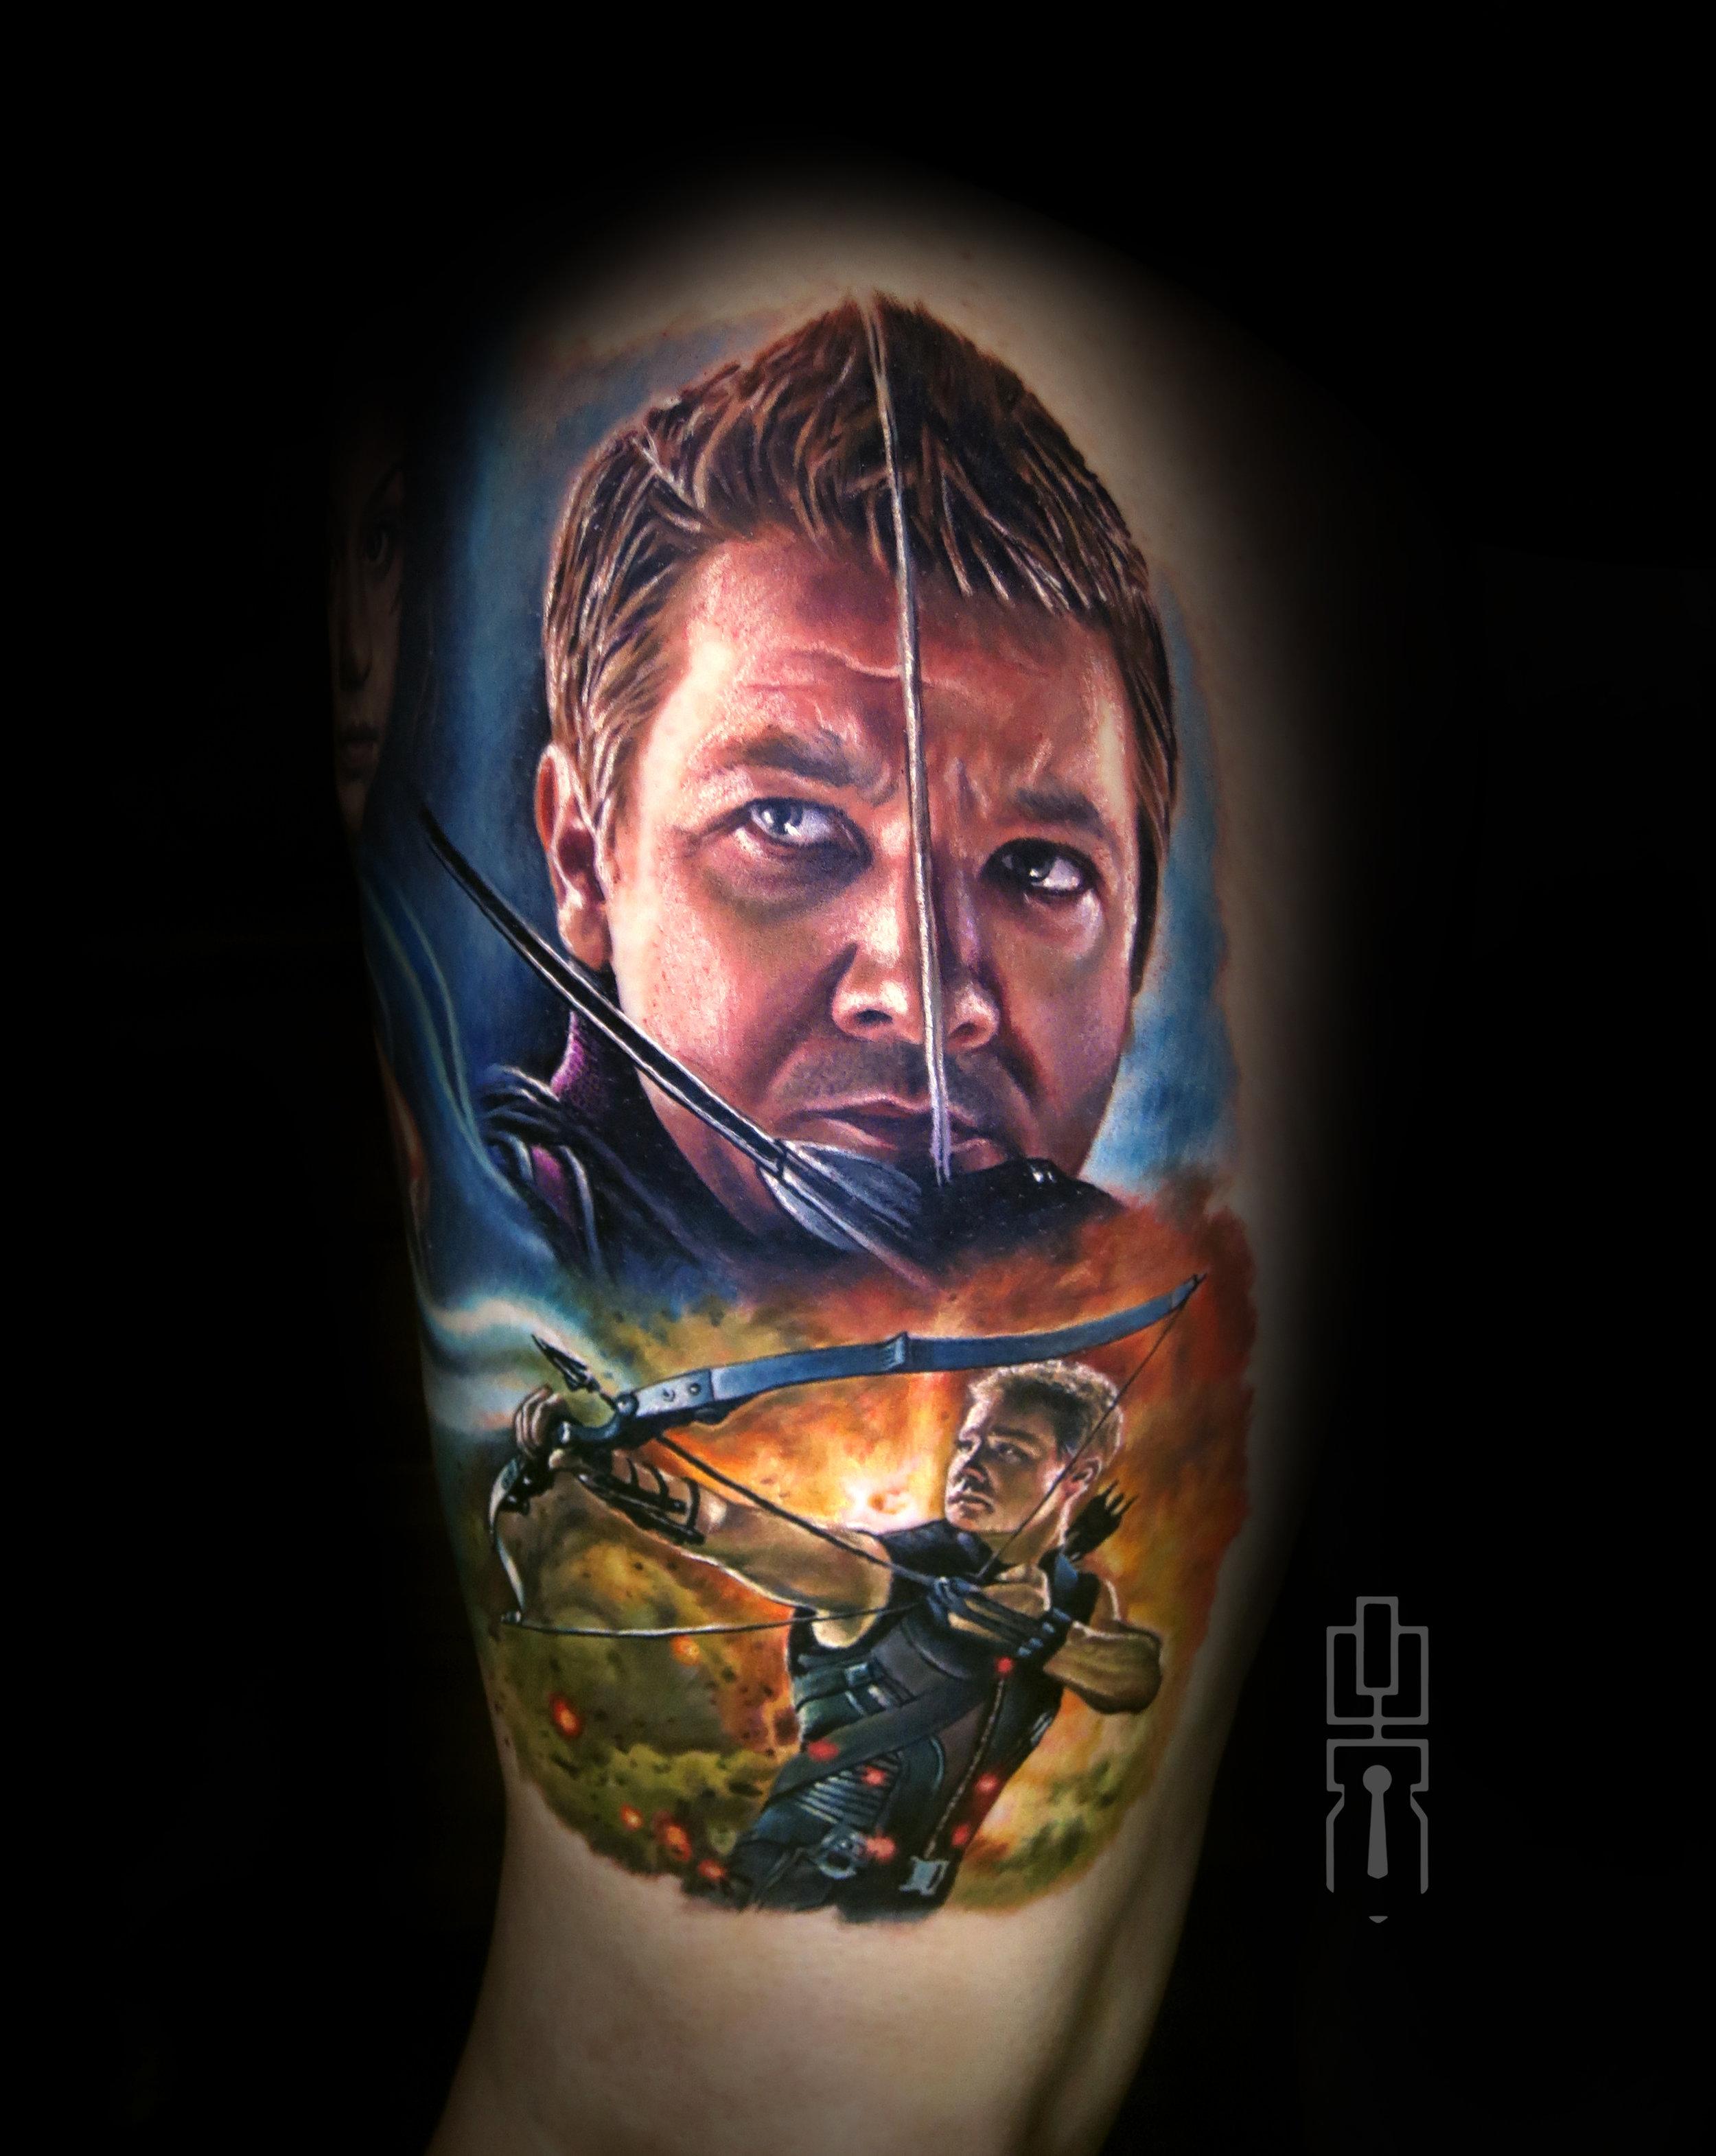 hawkeye jeremy renner avengers marvel tattoo.jpg